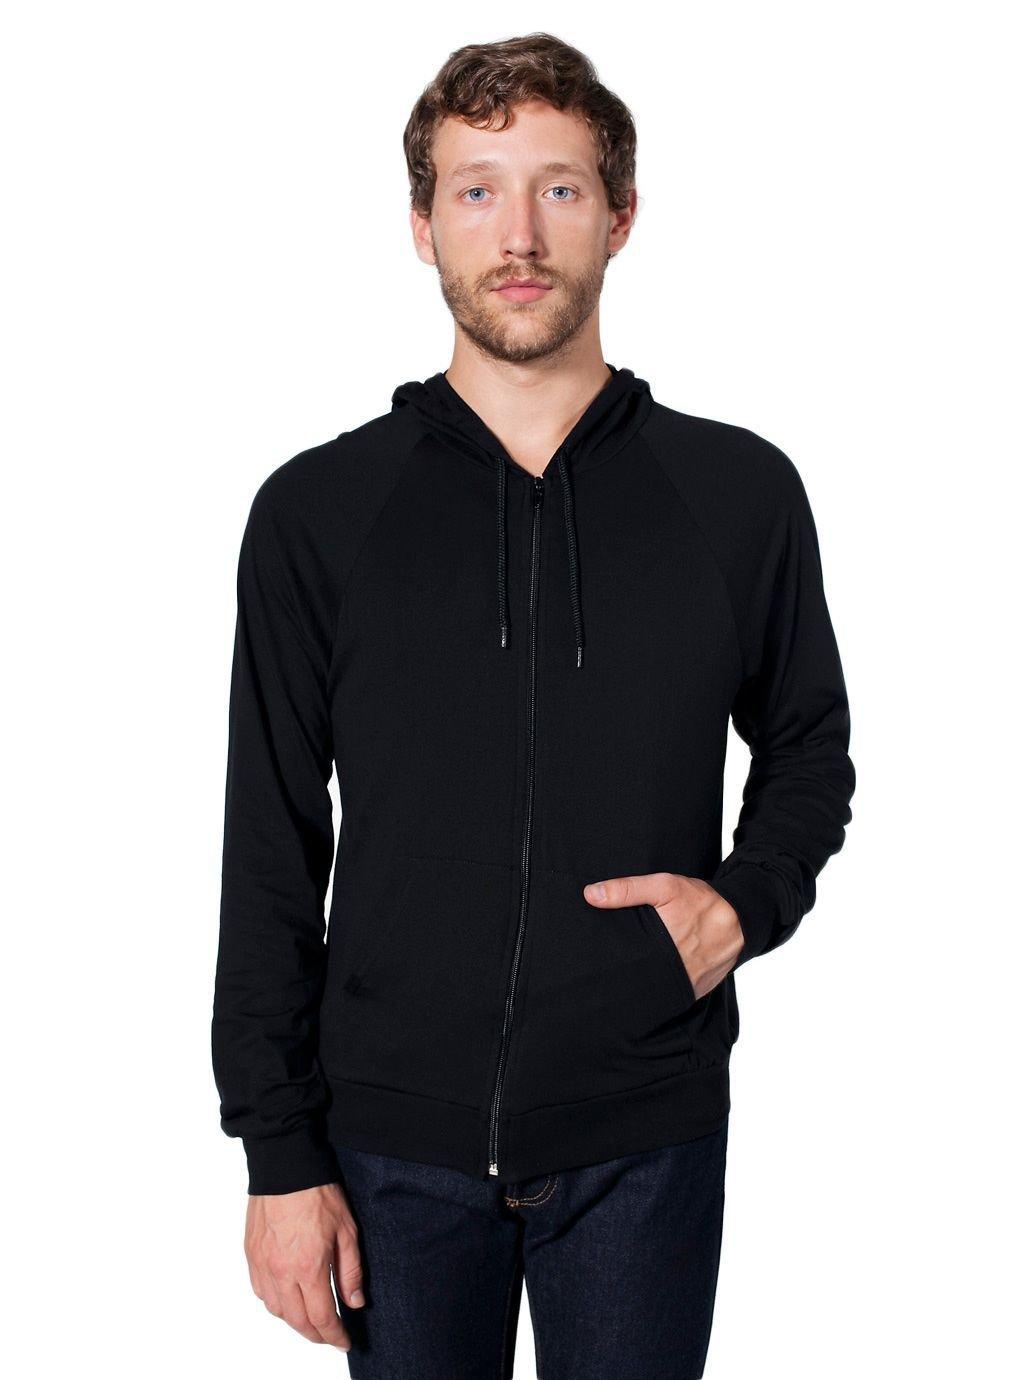 American Apparel Men Fine Jersey Zip Hoodie Size S Black by American Apparel (Image #2)